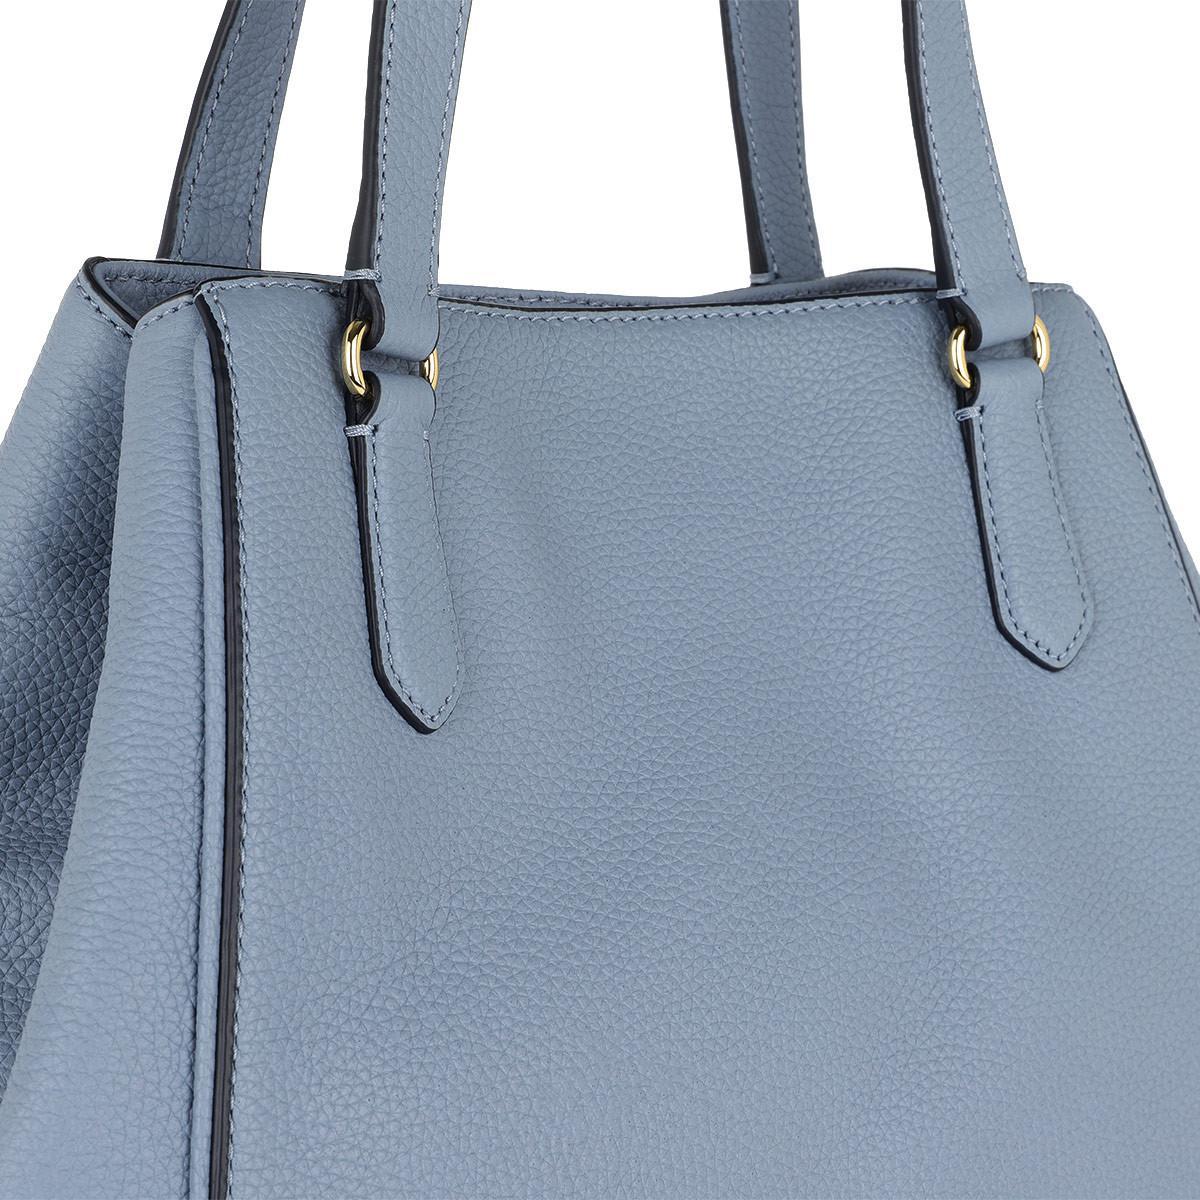 c841151b7a6f Lauren by Ralph Lauren - Huntley Tote Medium Blue Mist - Lyst. View  fullscreen